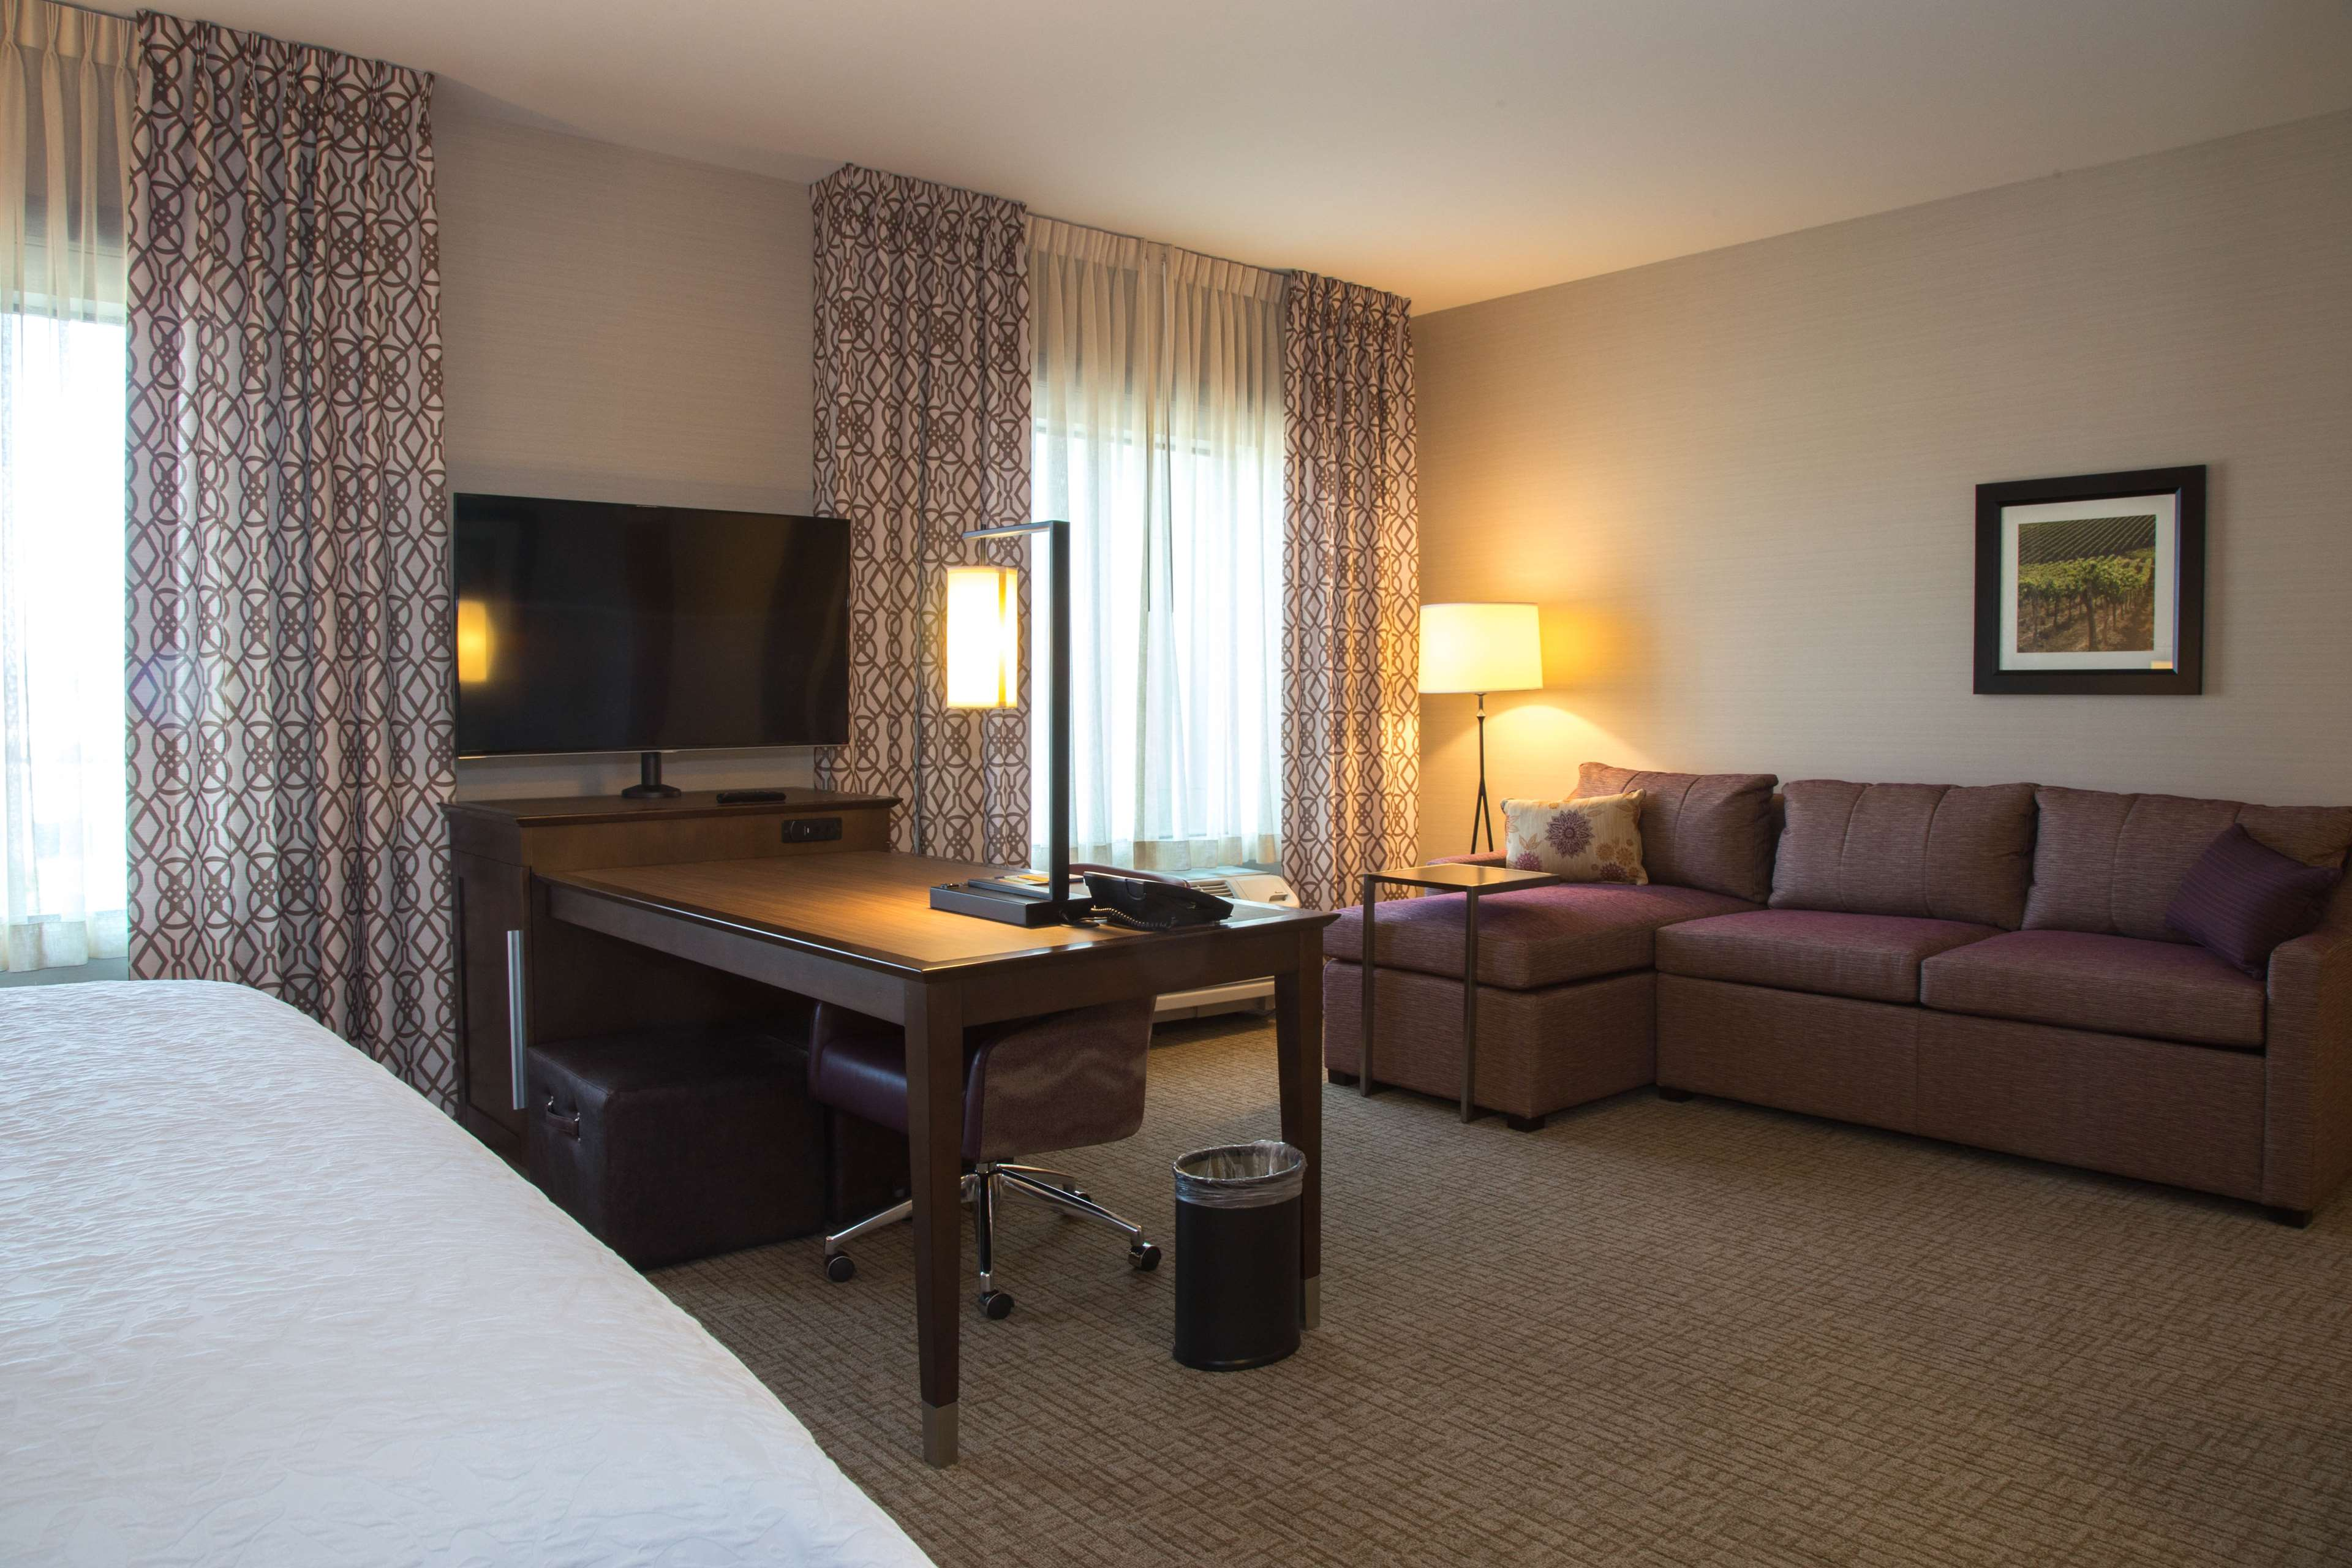 Hampton Inn & Suites Murrieta Temecula image 12